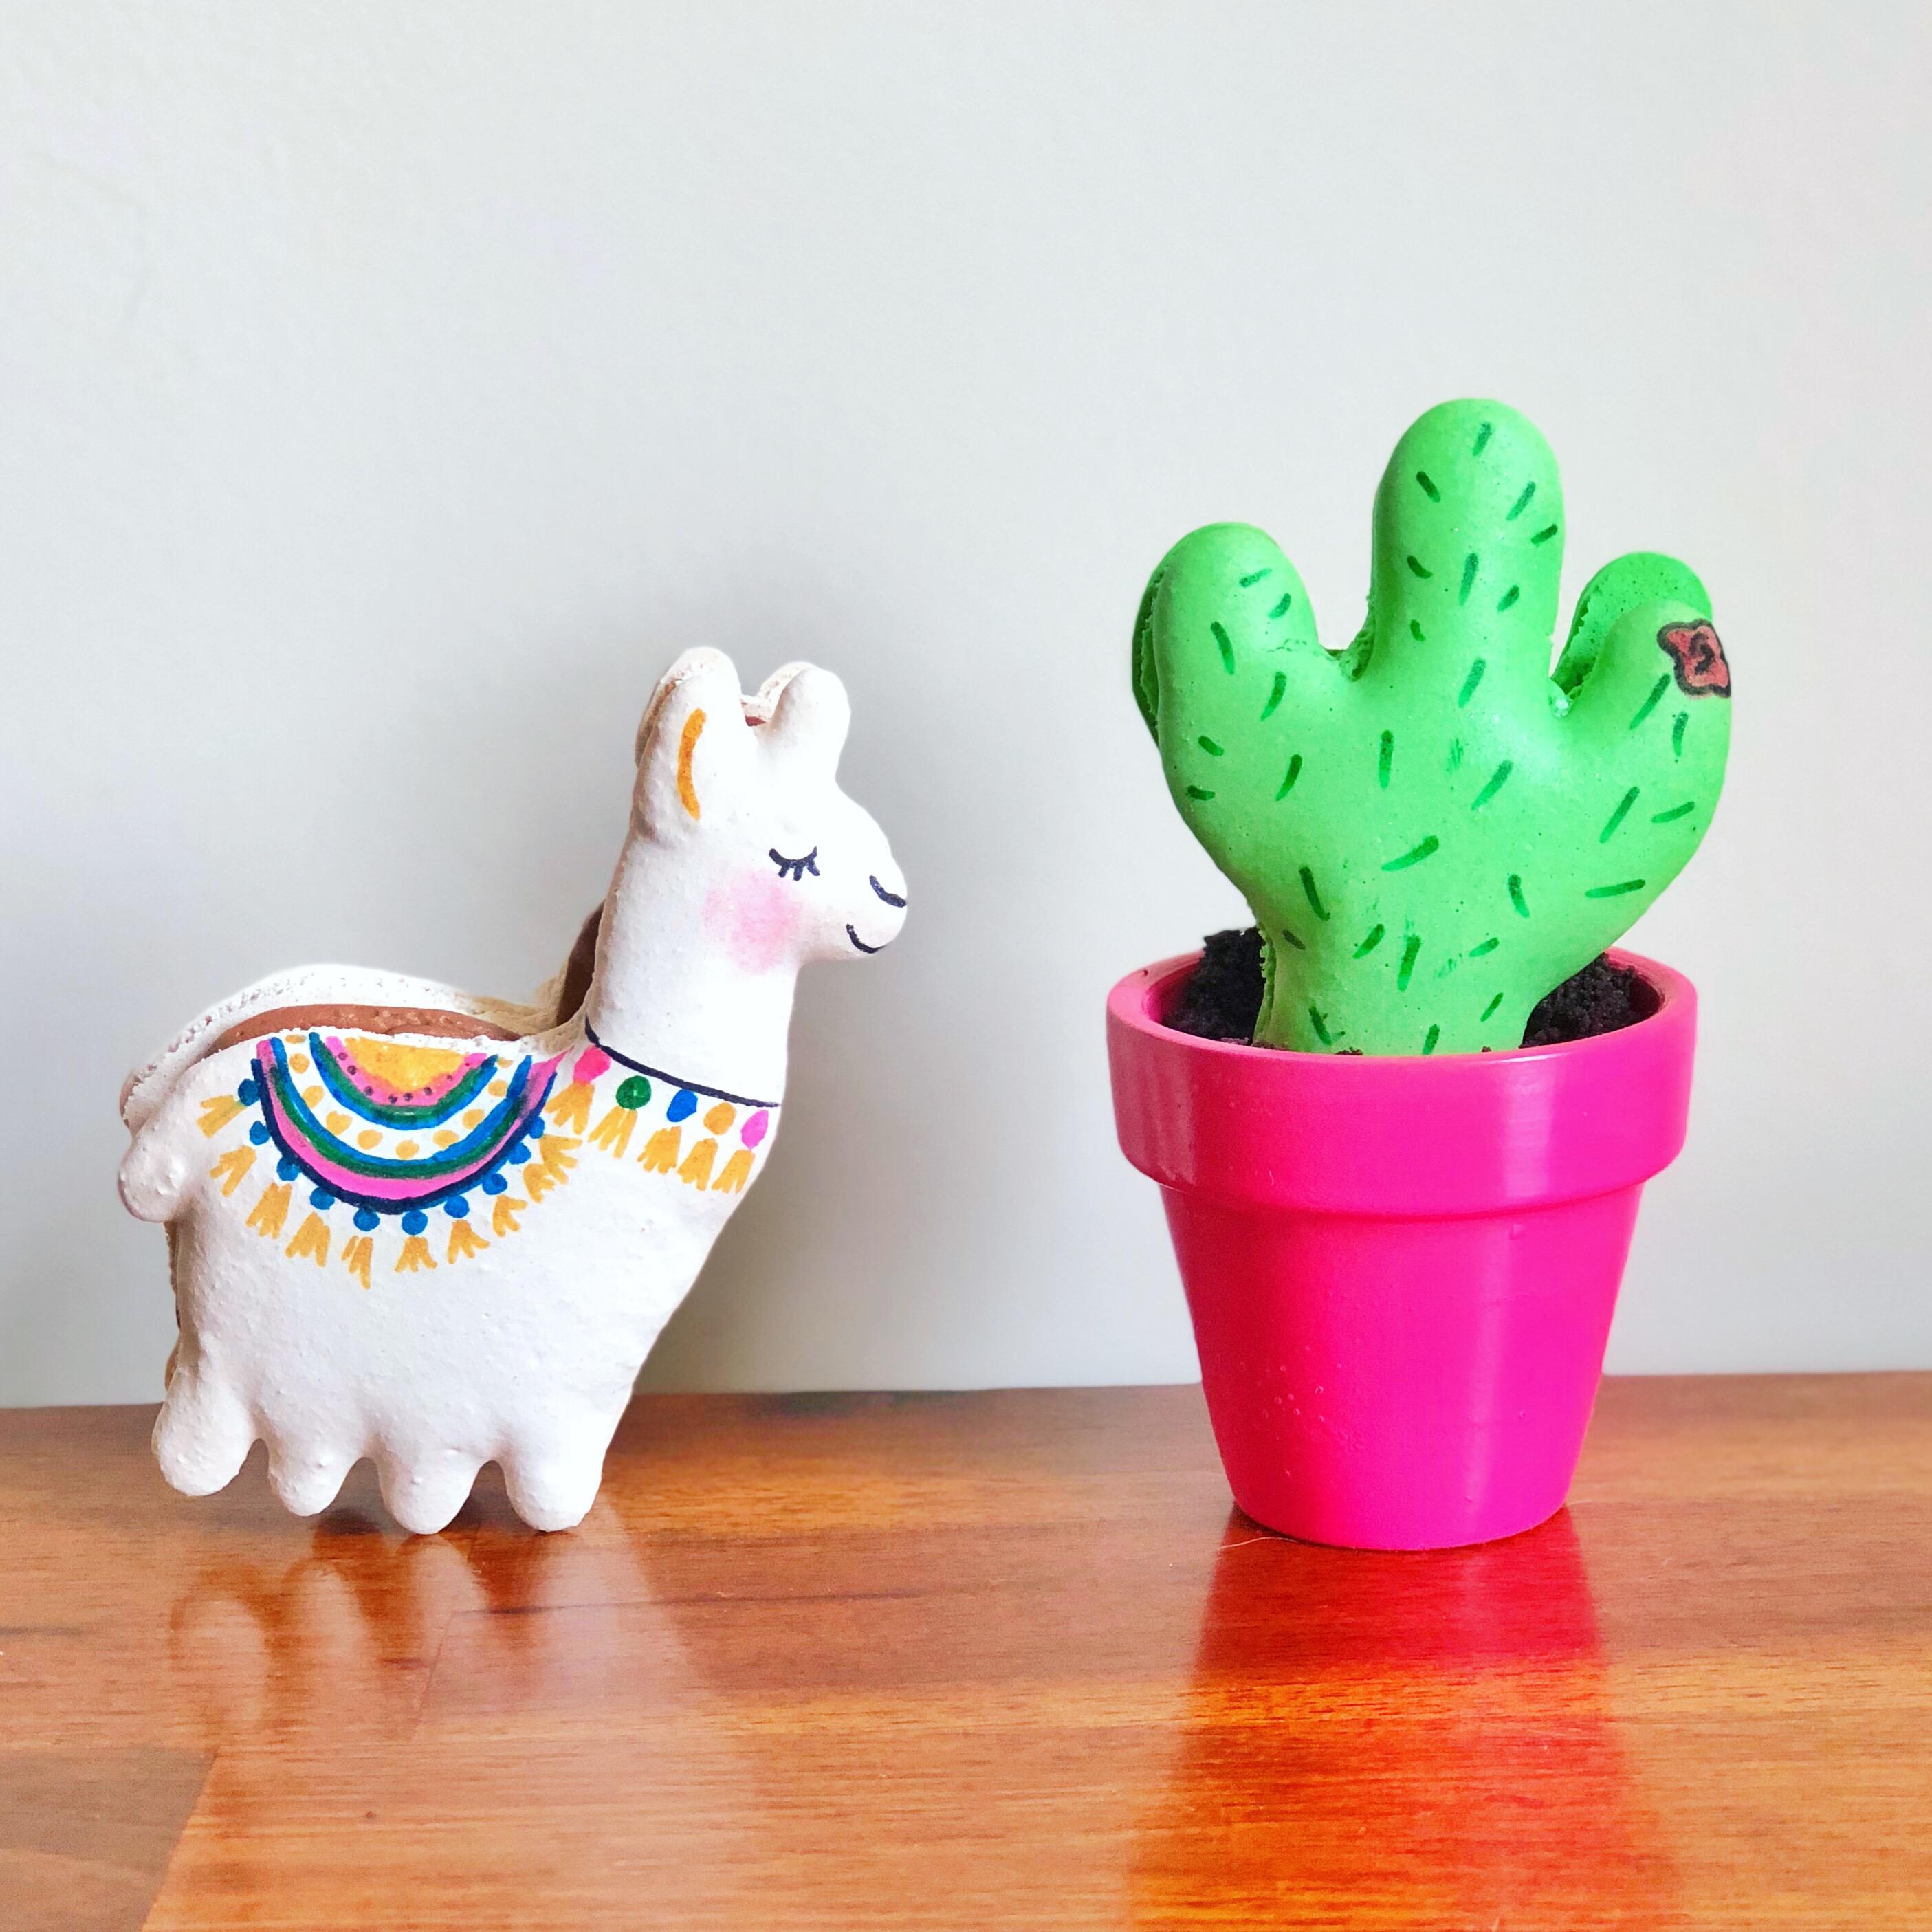 Llama & Cactus Macaron